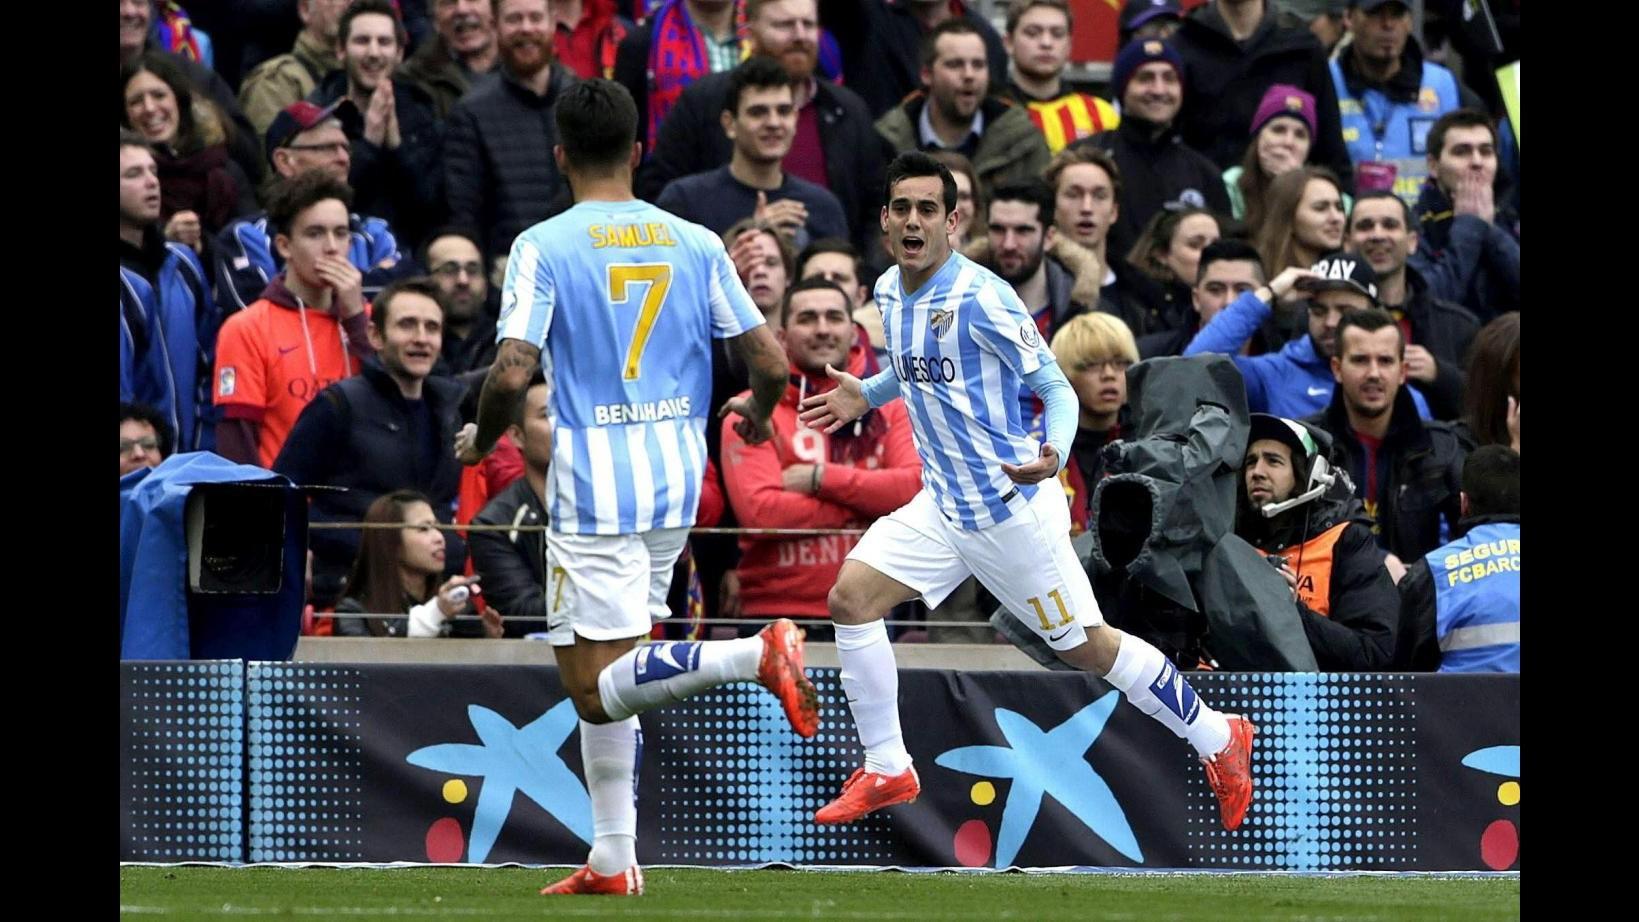 Liga: Barcellona cade in casa, Malaga vince 1-0 al Camp Nou. Atletico travolge Almeria